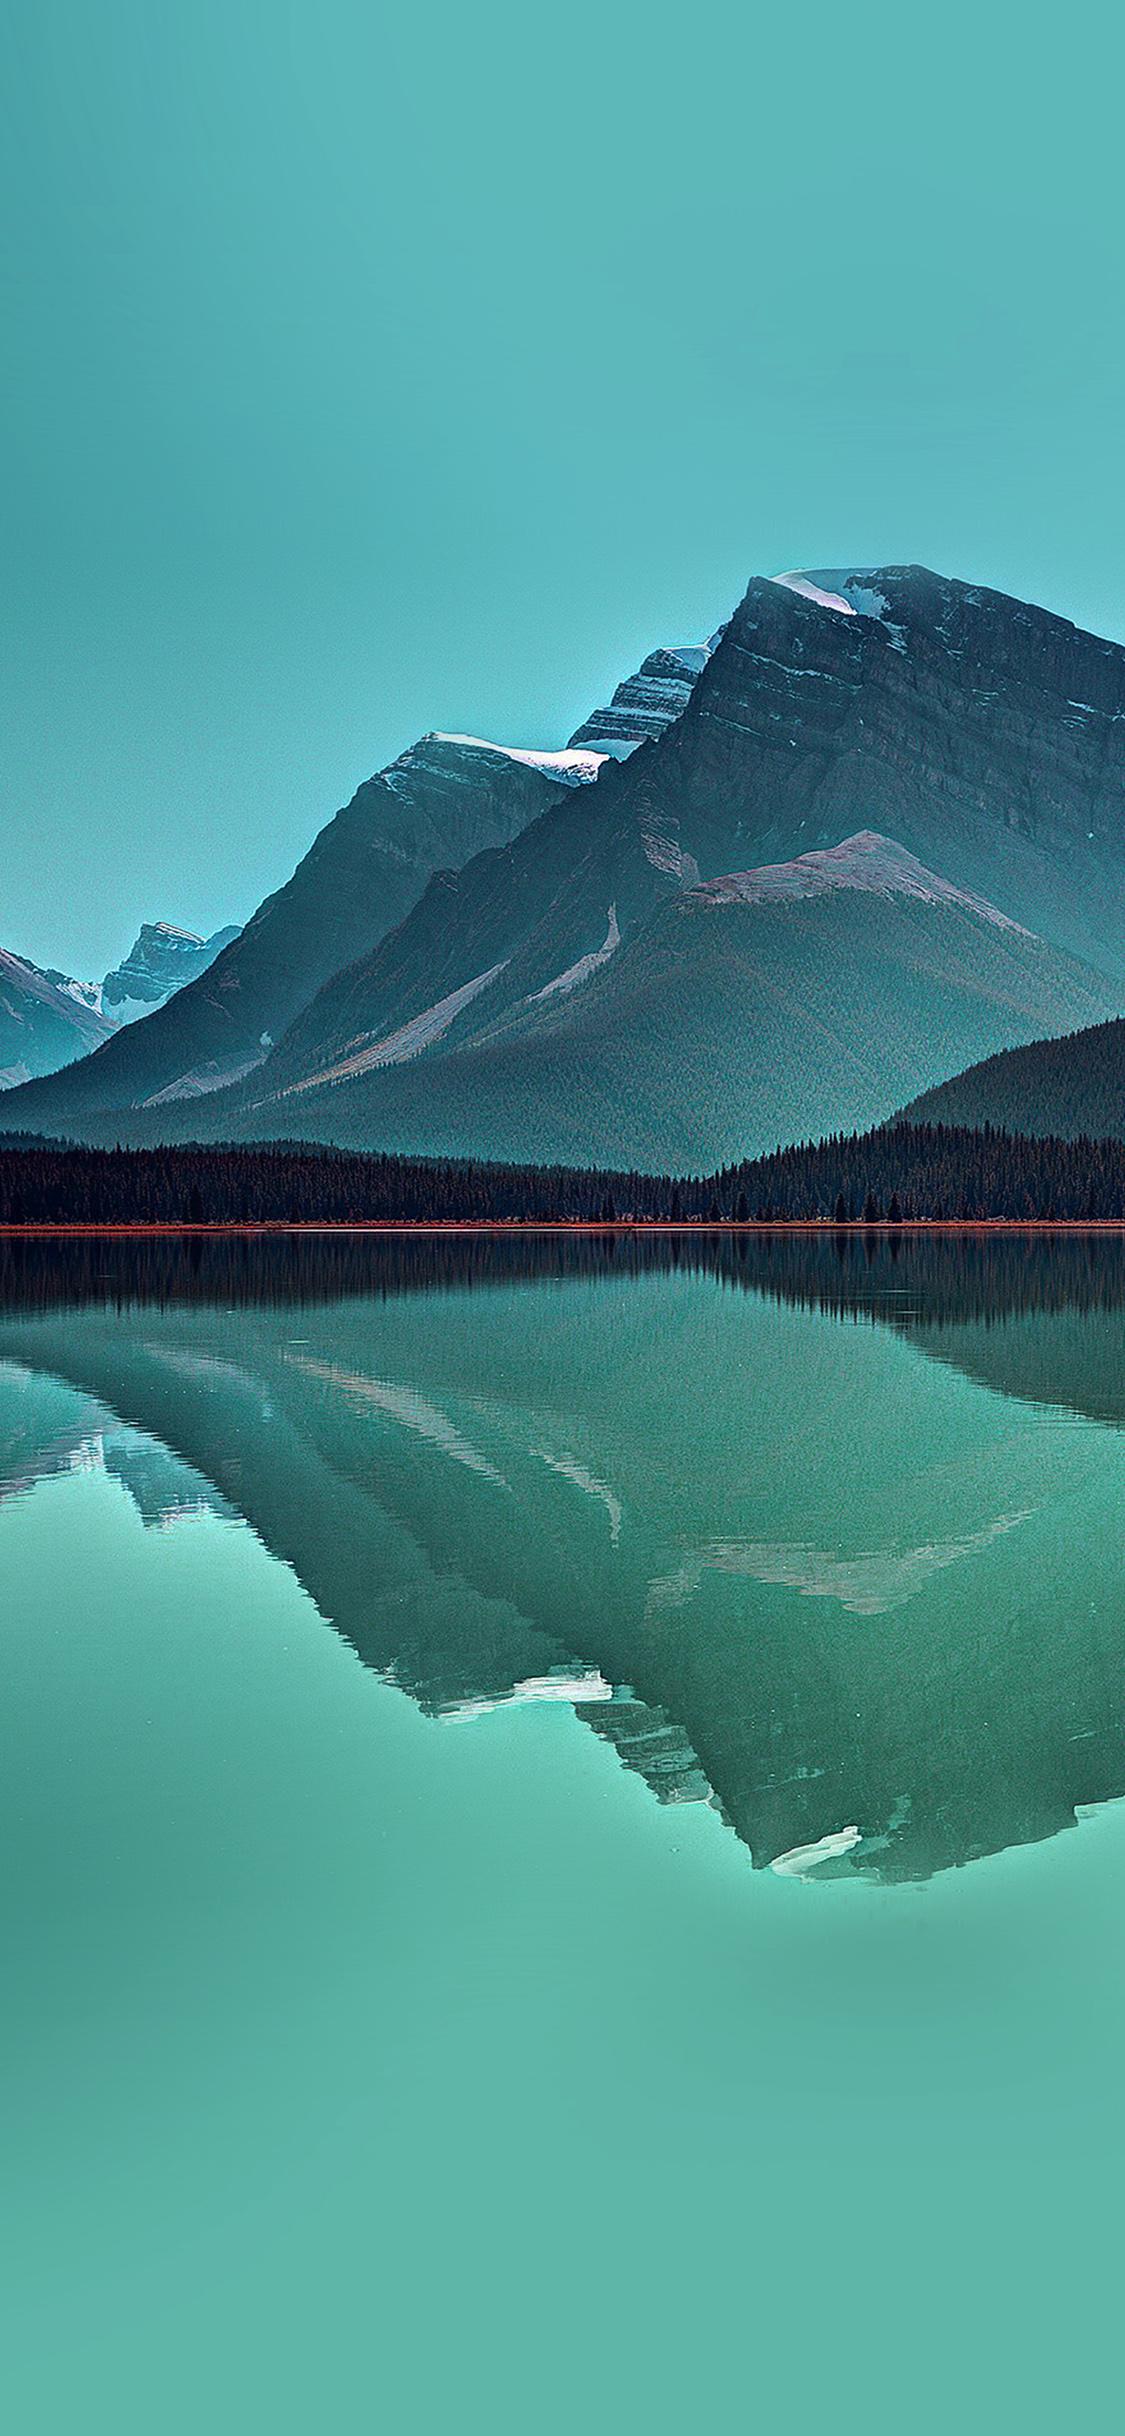 iPhonexpapers.com-Apple-iPhone-wallpaper-ne74-lake-mountain-reflection-nature-green